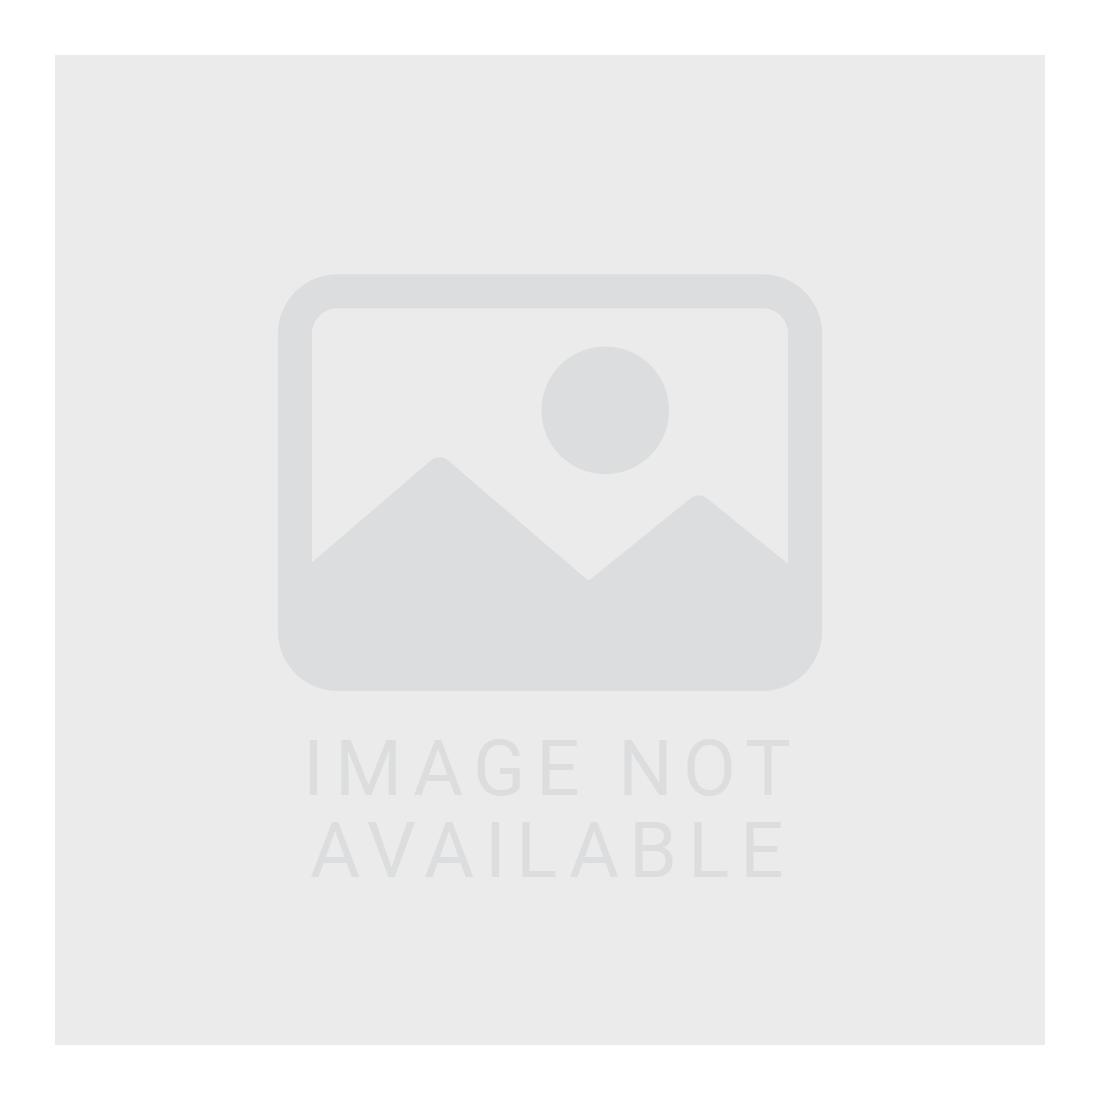 Hellcat Redeye Backpack Case Cooler